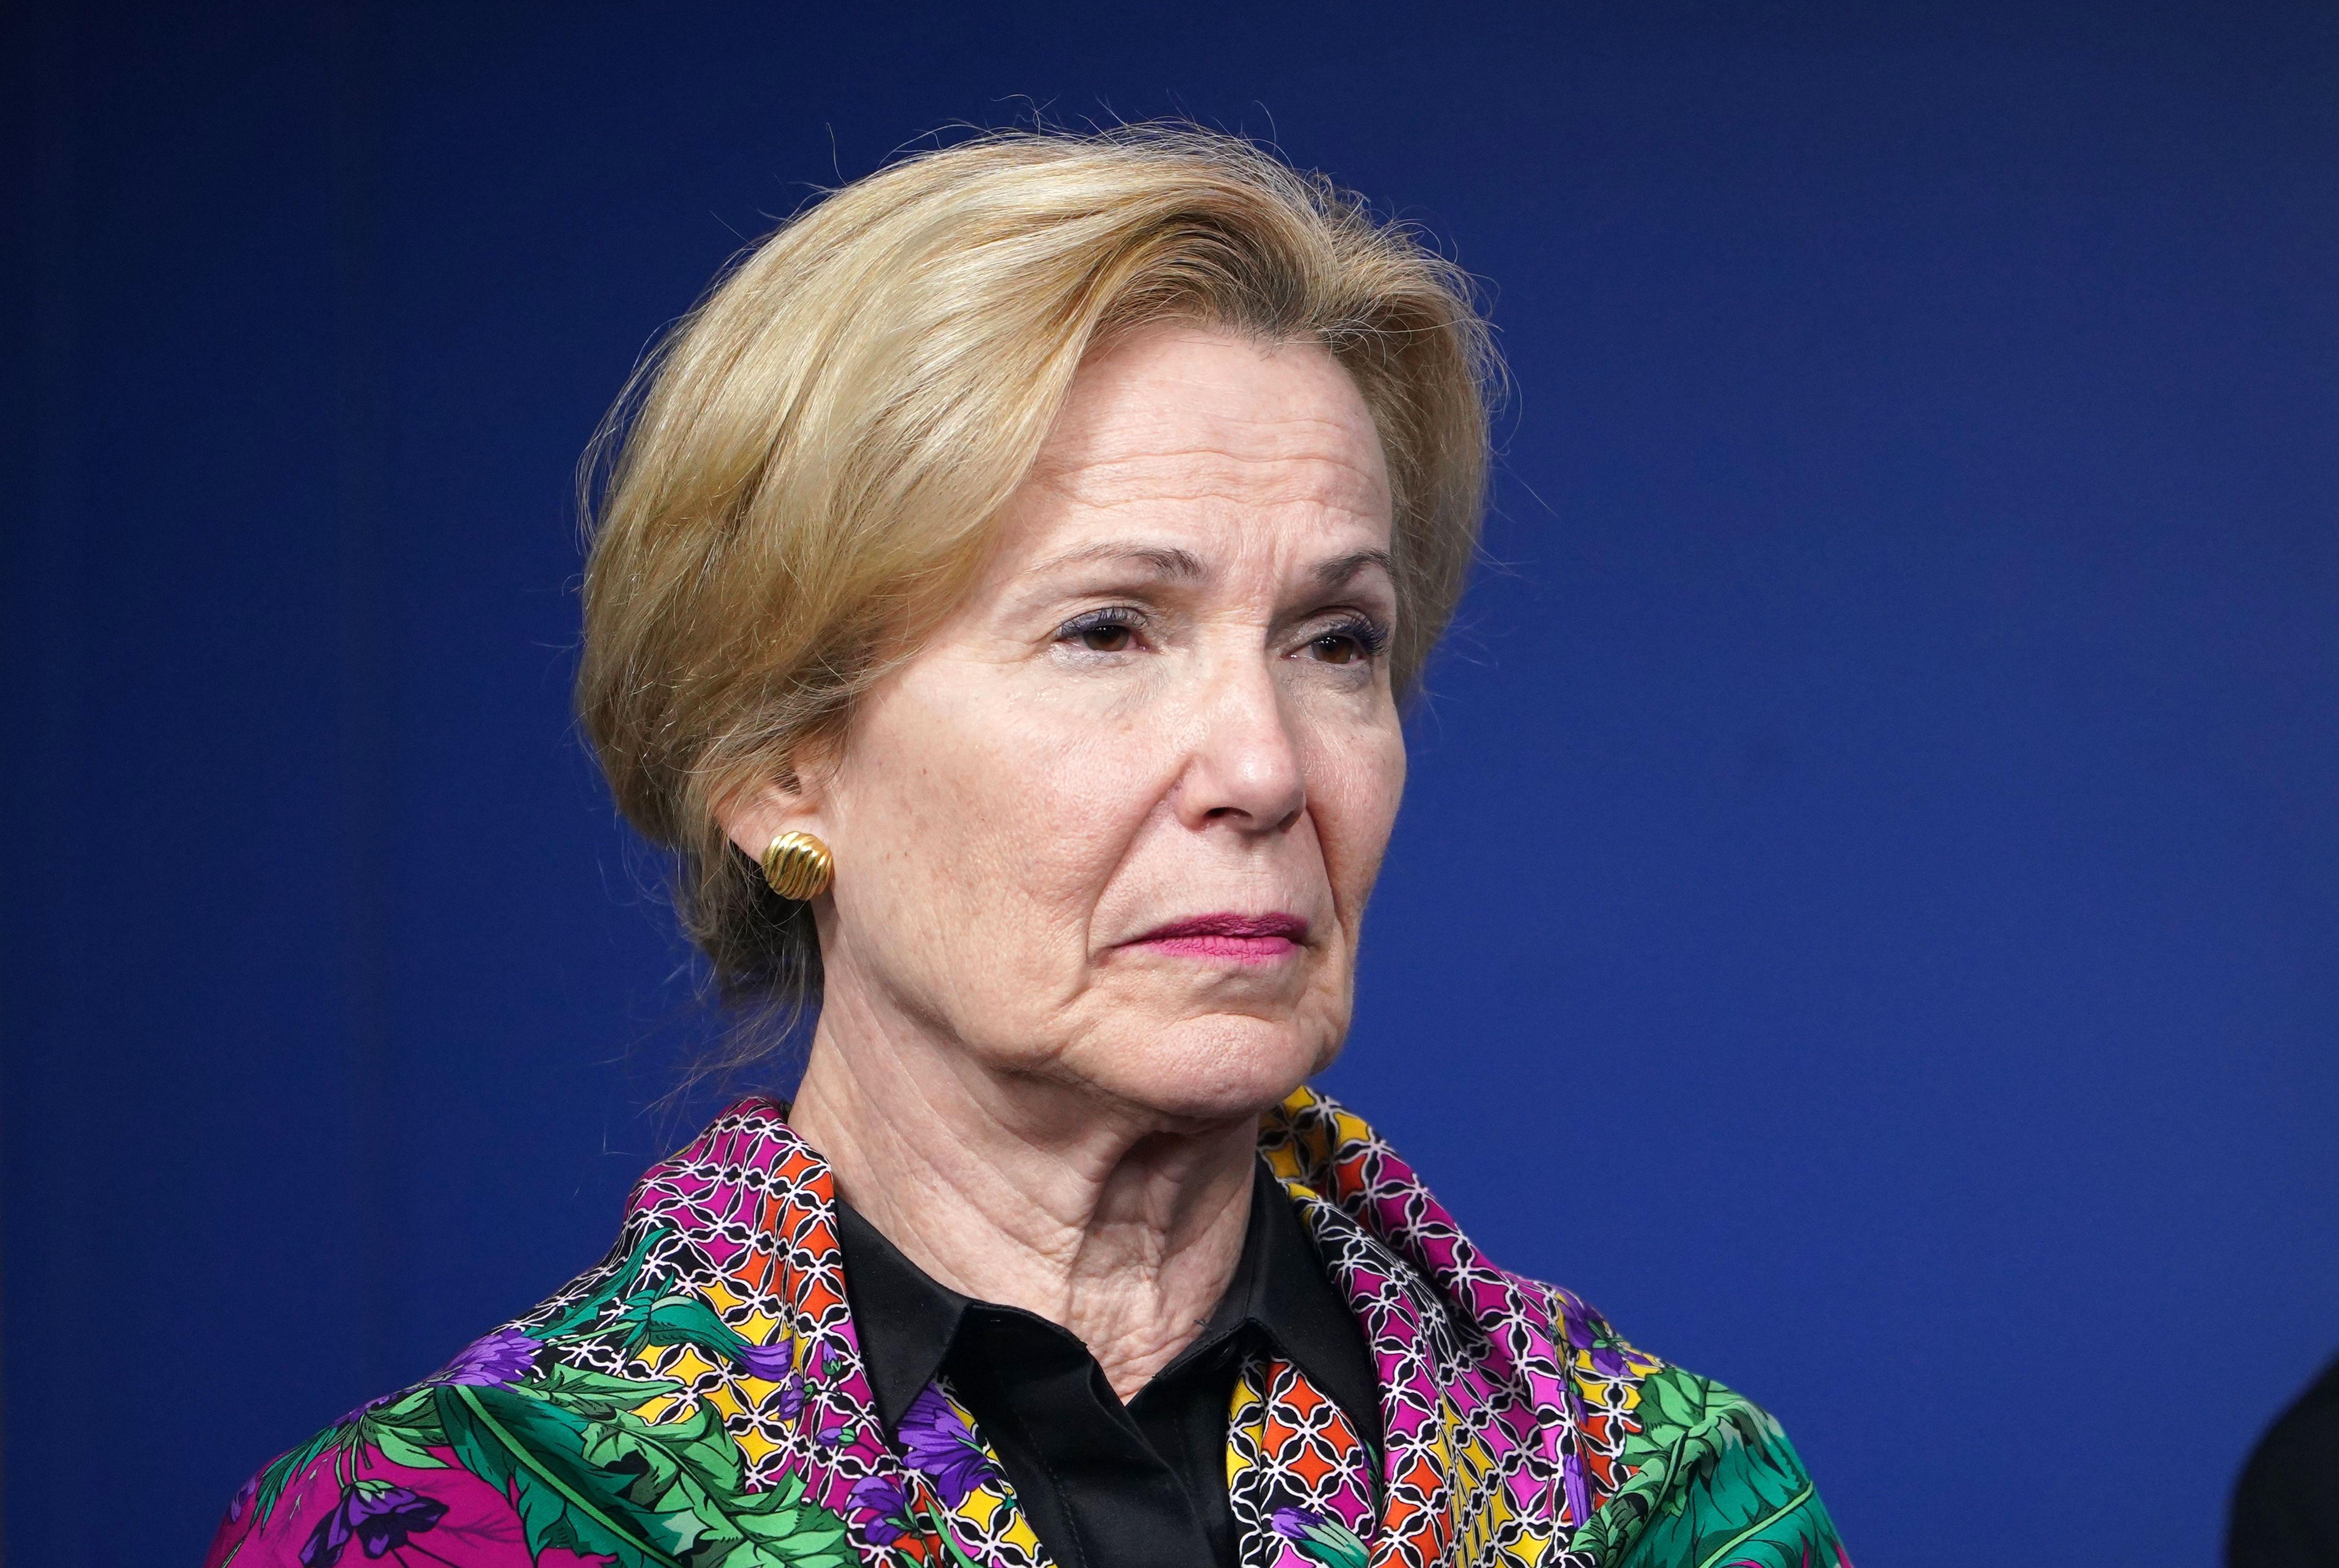 Dr. Deborah Birx listens during a coronavirus briefing at the White House on April 20.